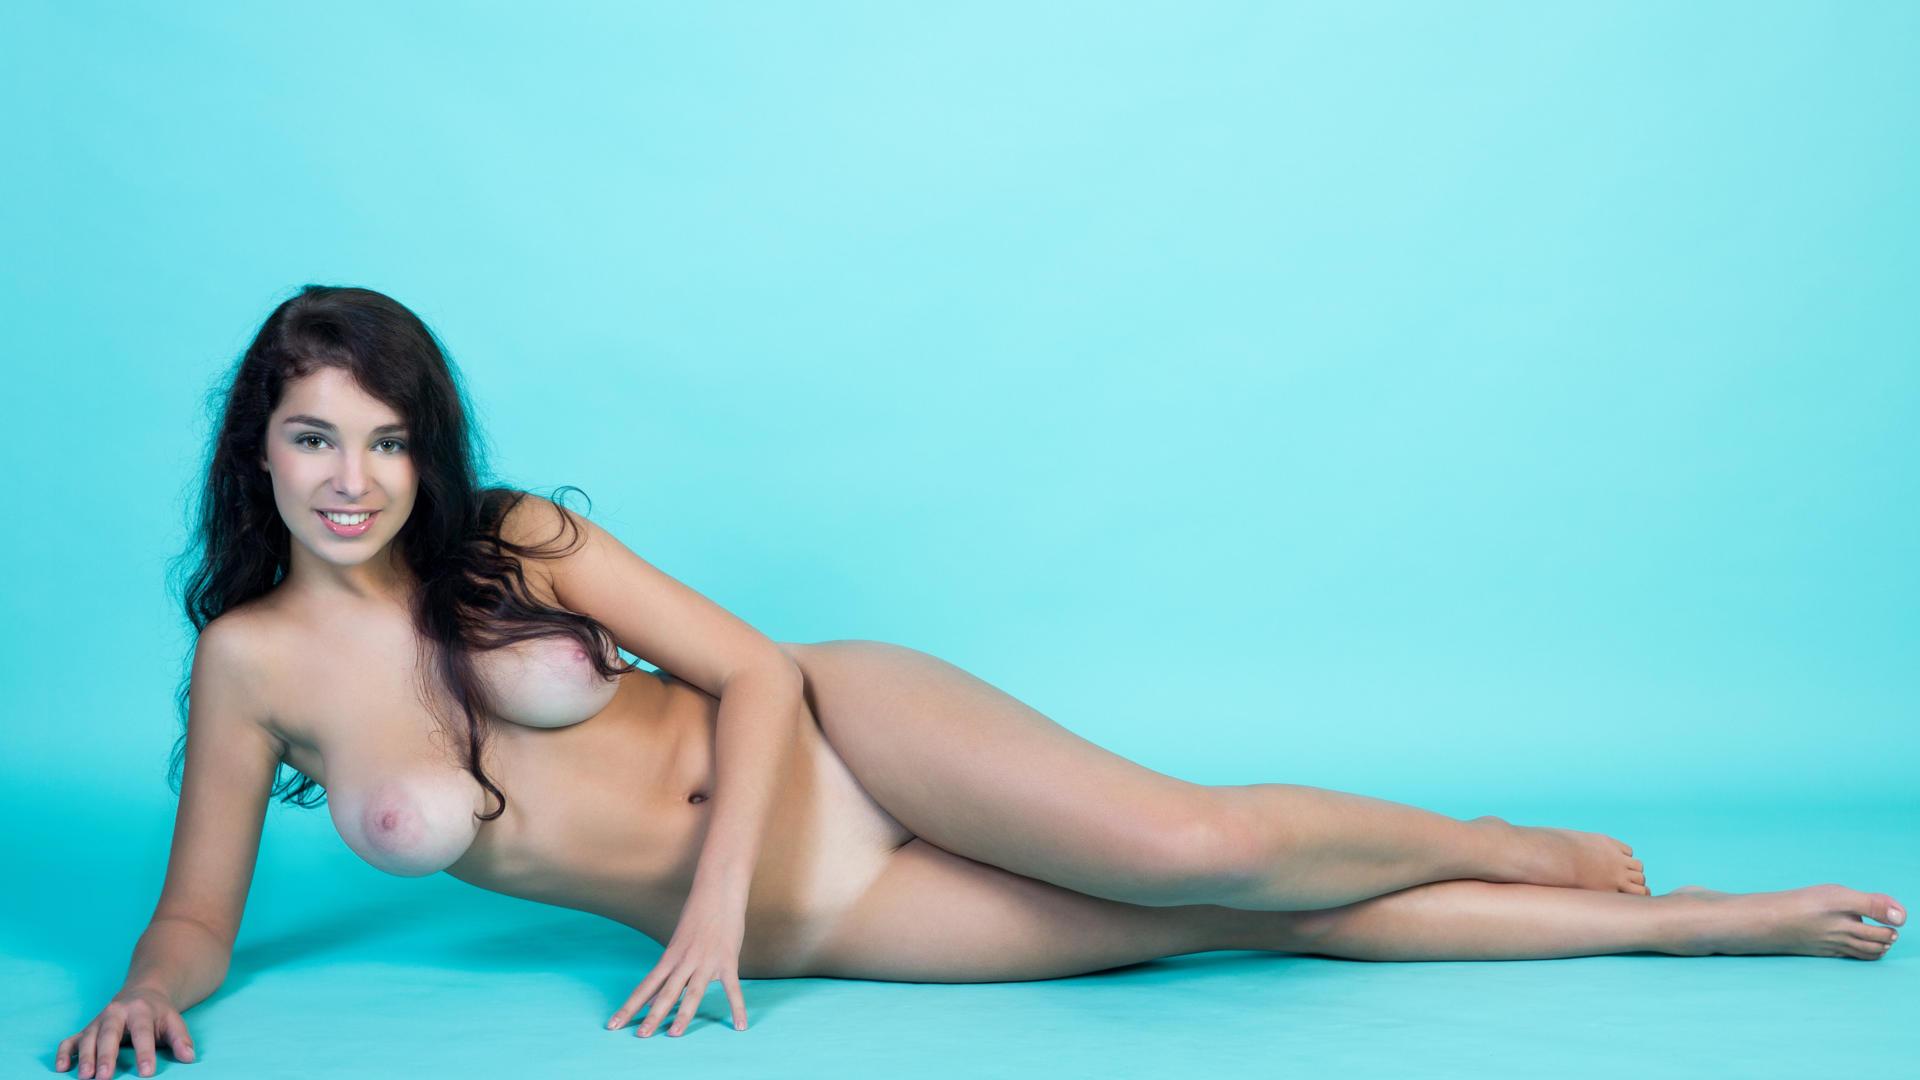 Boob russian nude model big brunette